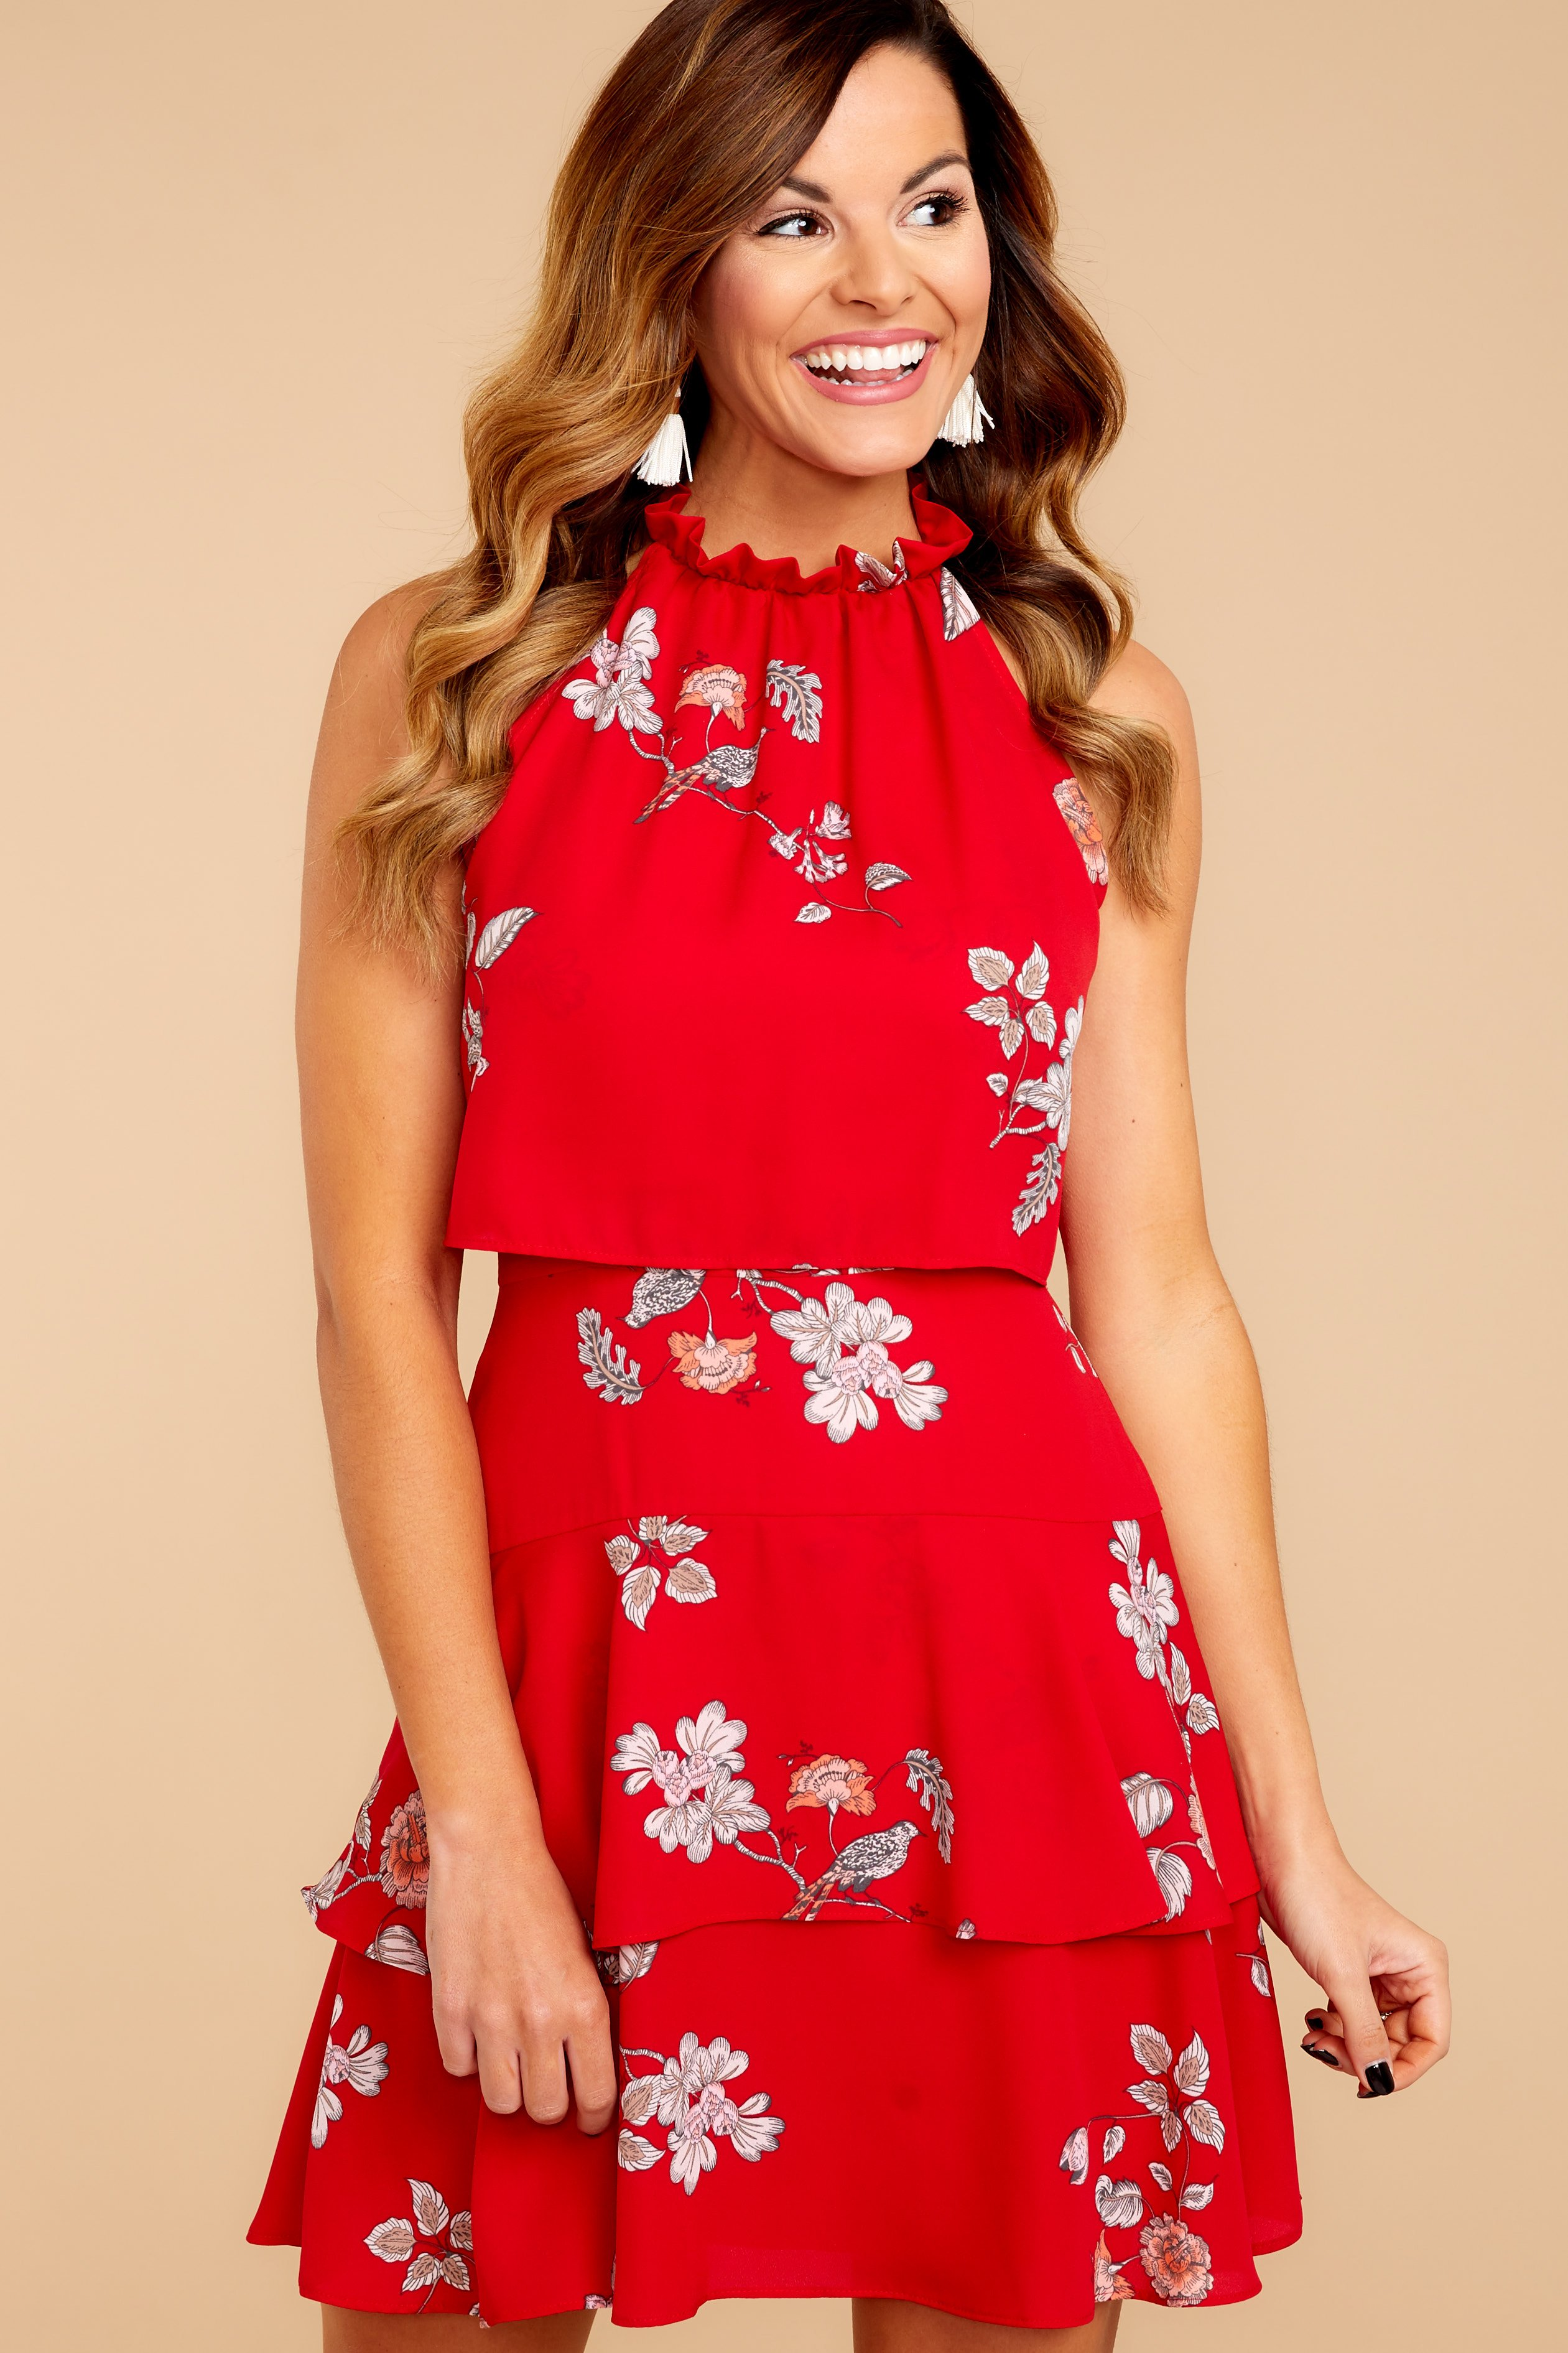 Red Dress bb dakota floral print dress - red dress - dress - $92.00 - red dress NHPMVWC